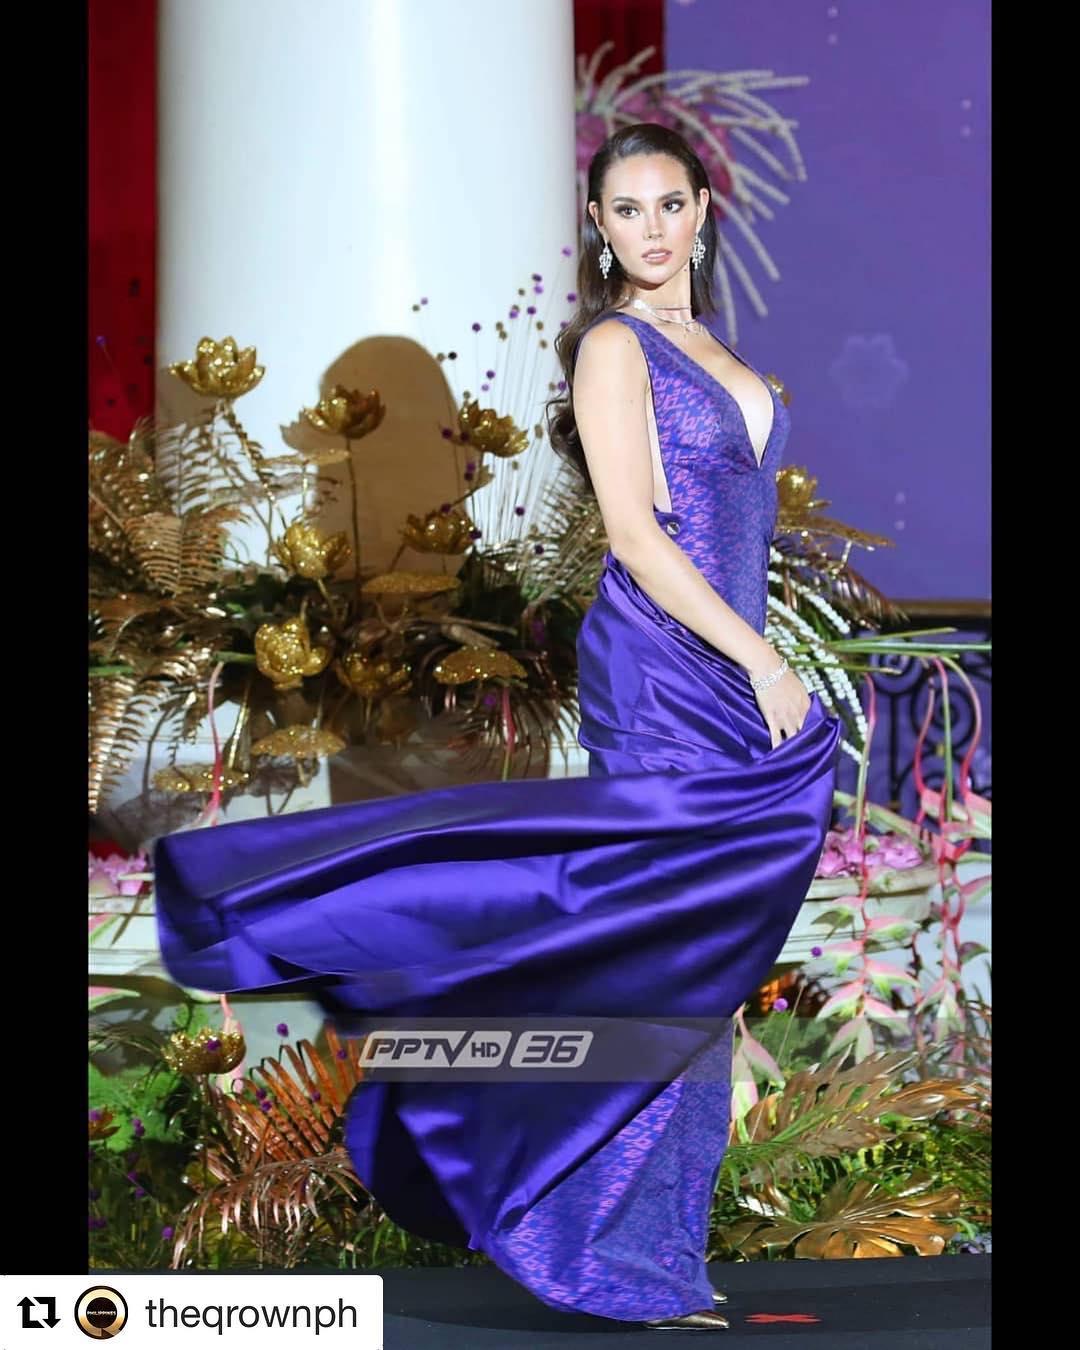 thai night gala dinner de candidatas a miss universe 2018. - Página 8 Uhctu9n4